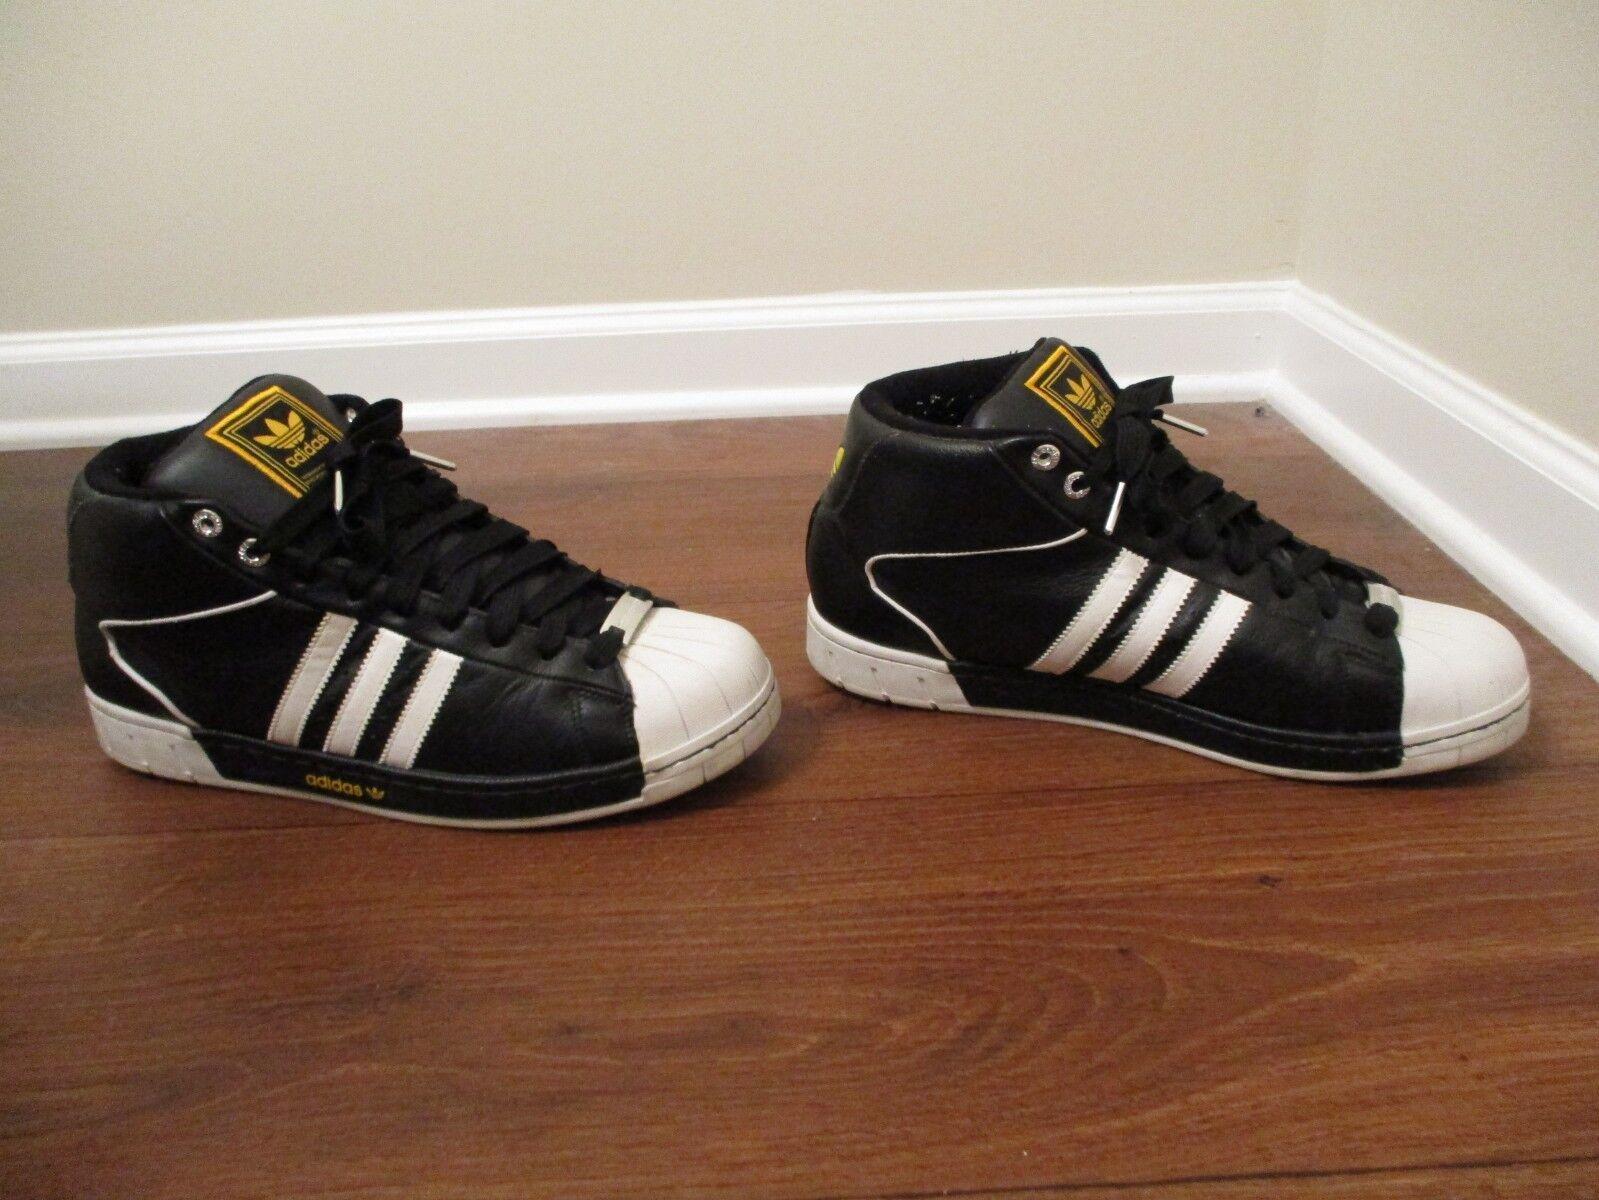 Classic 2006 era indossato dimensioni 13 adidas modello atteggiamento atteggiamento atteggiamento scarpe d'oro bianco nero) 908170